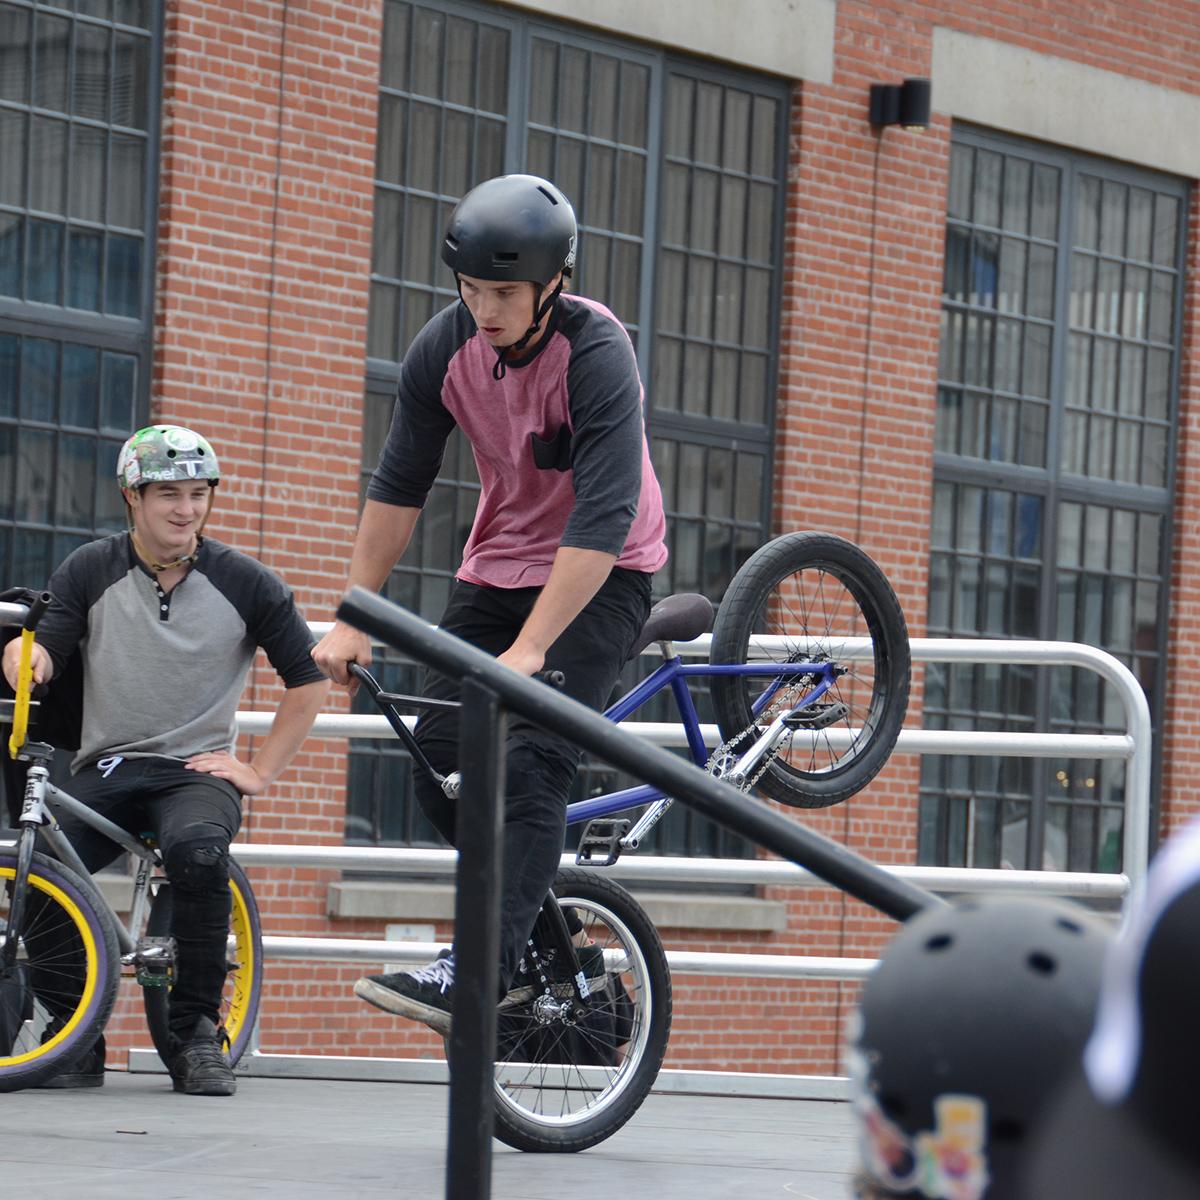 Hang Five at BMX Dew Tour Am Series in Toronto